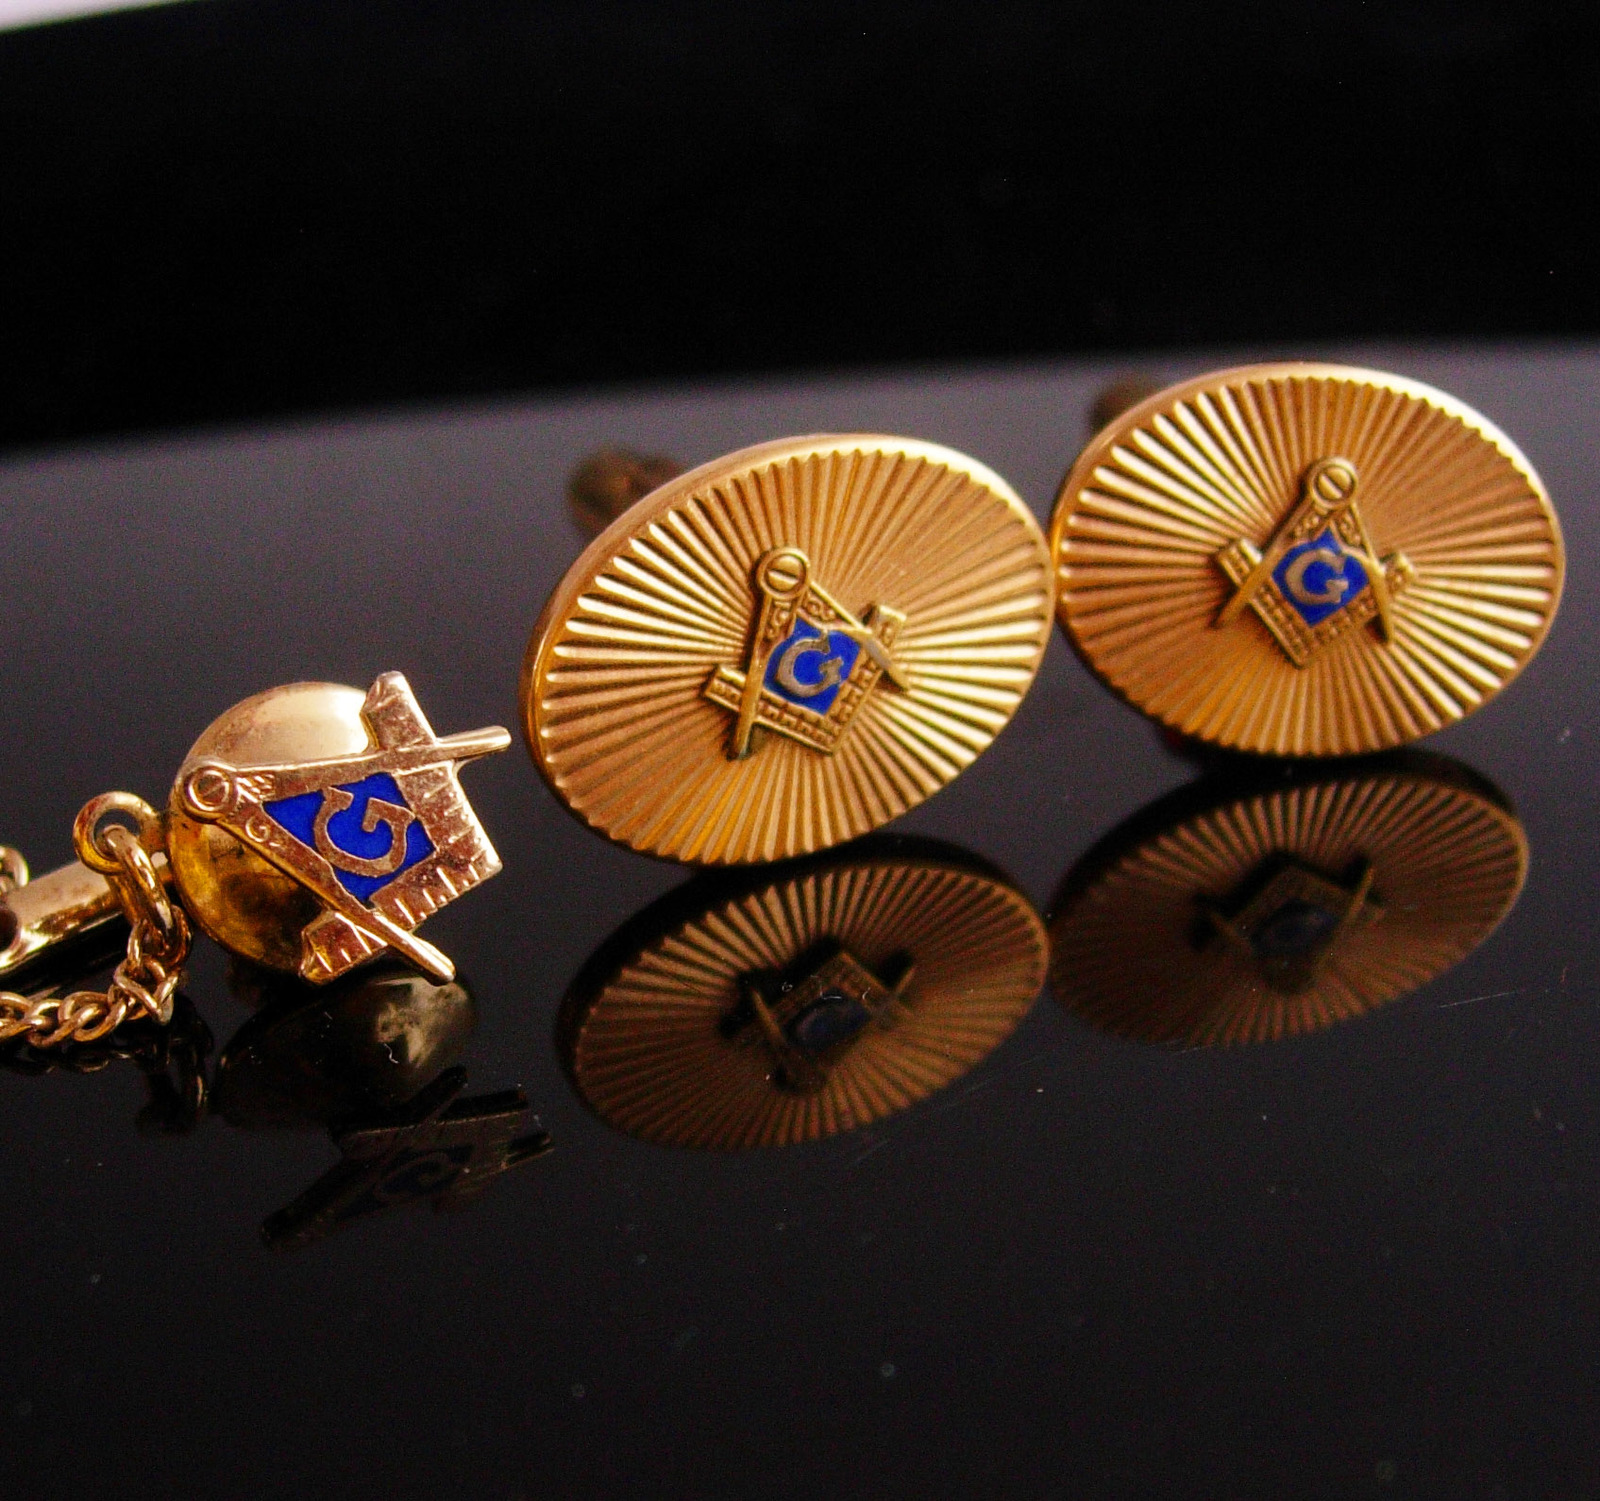 f7f489a760cd Vintage Masonic Cufflinks / Masonic tie tack and 19 similar items. Masonic5